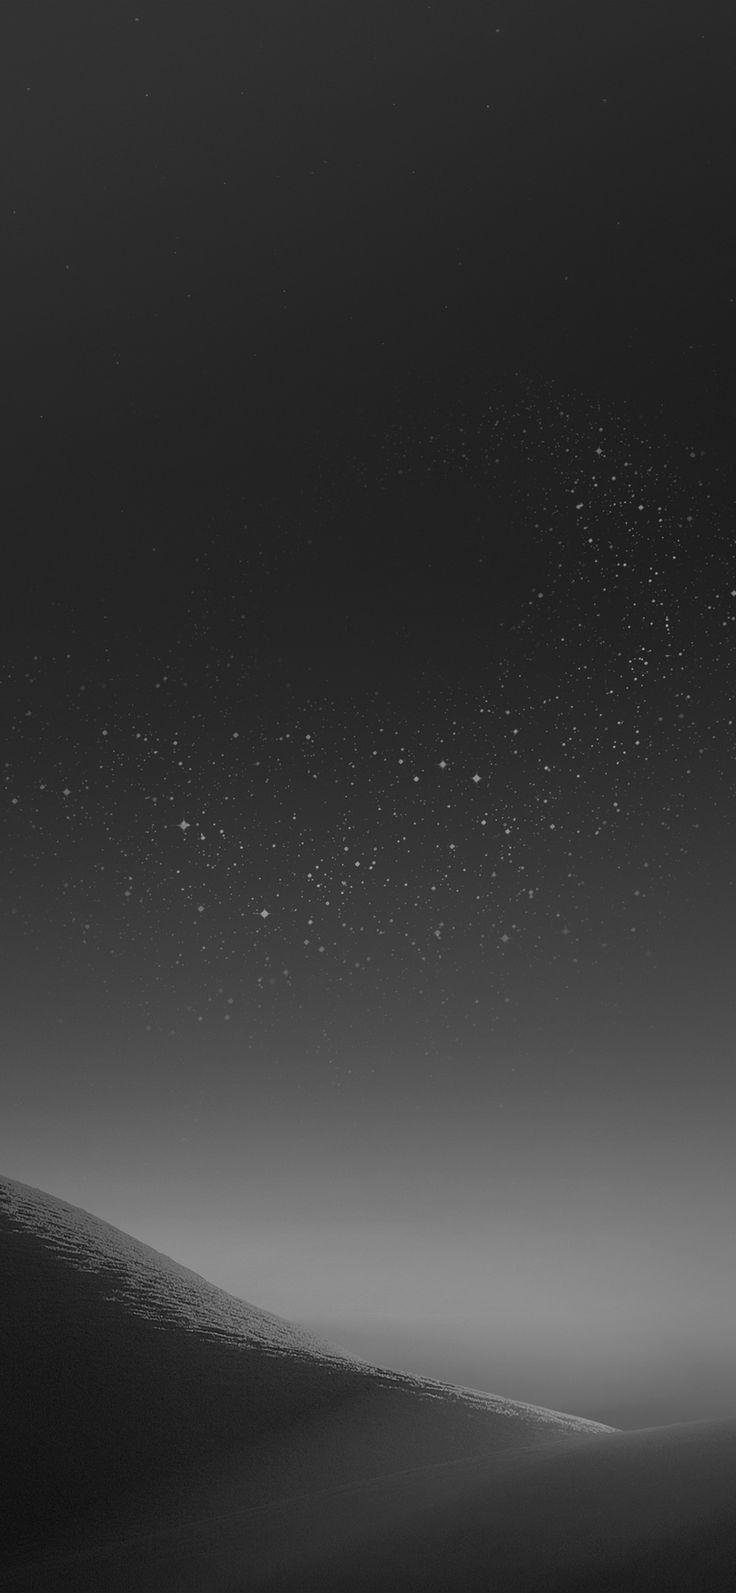 Iphone X Wallpaper Bc37 Galaxy Night Sky Star Art Illustration